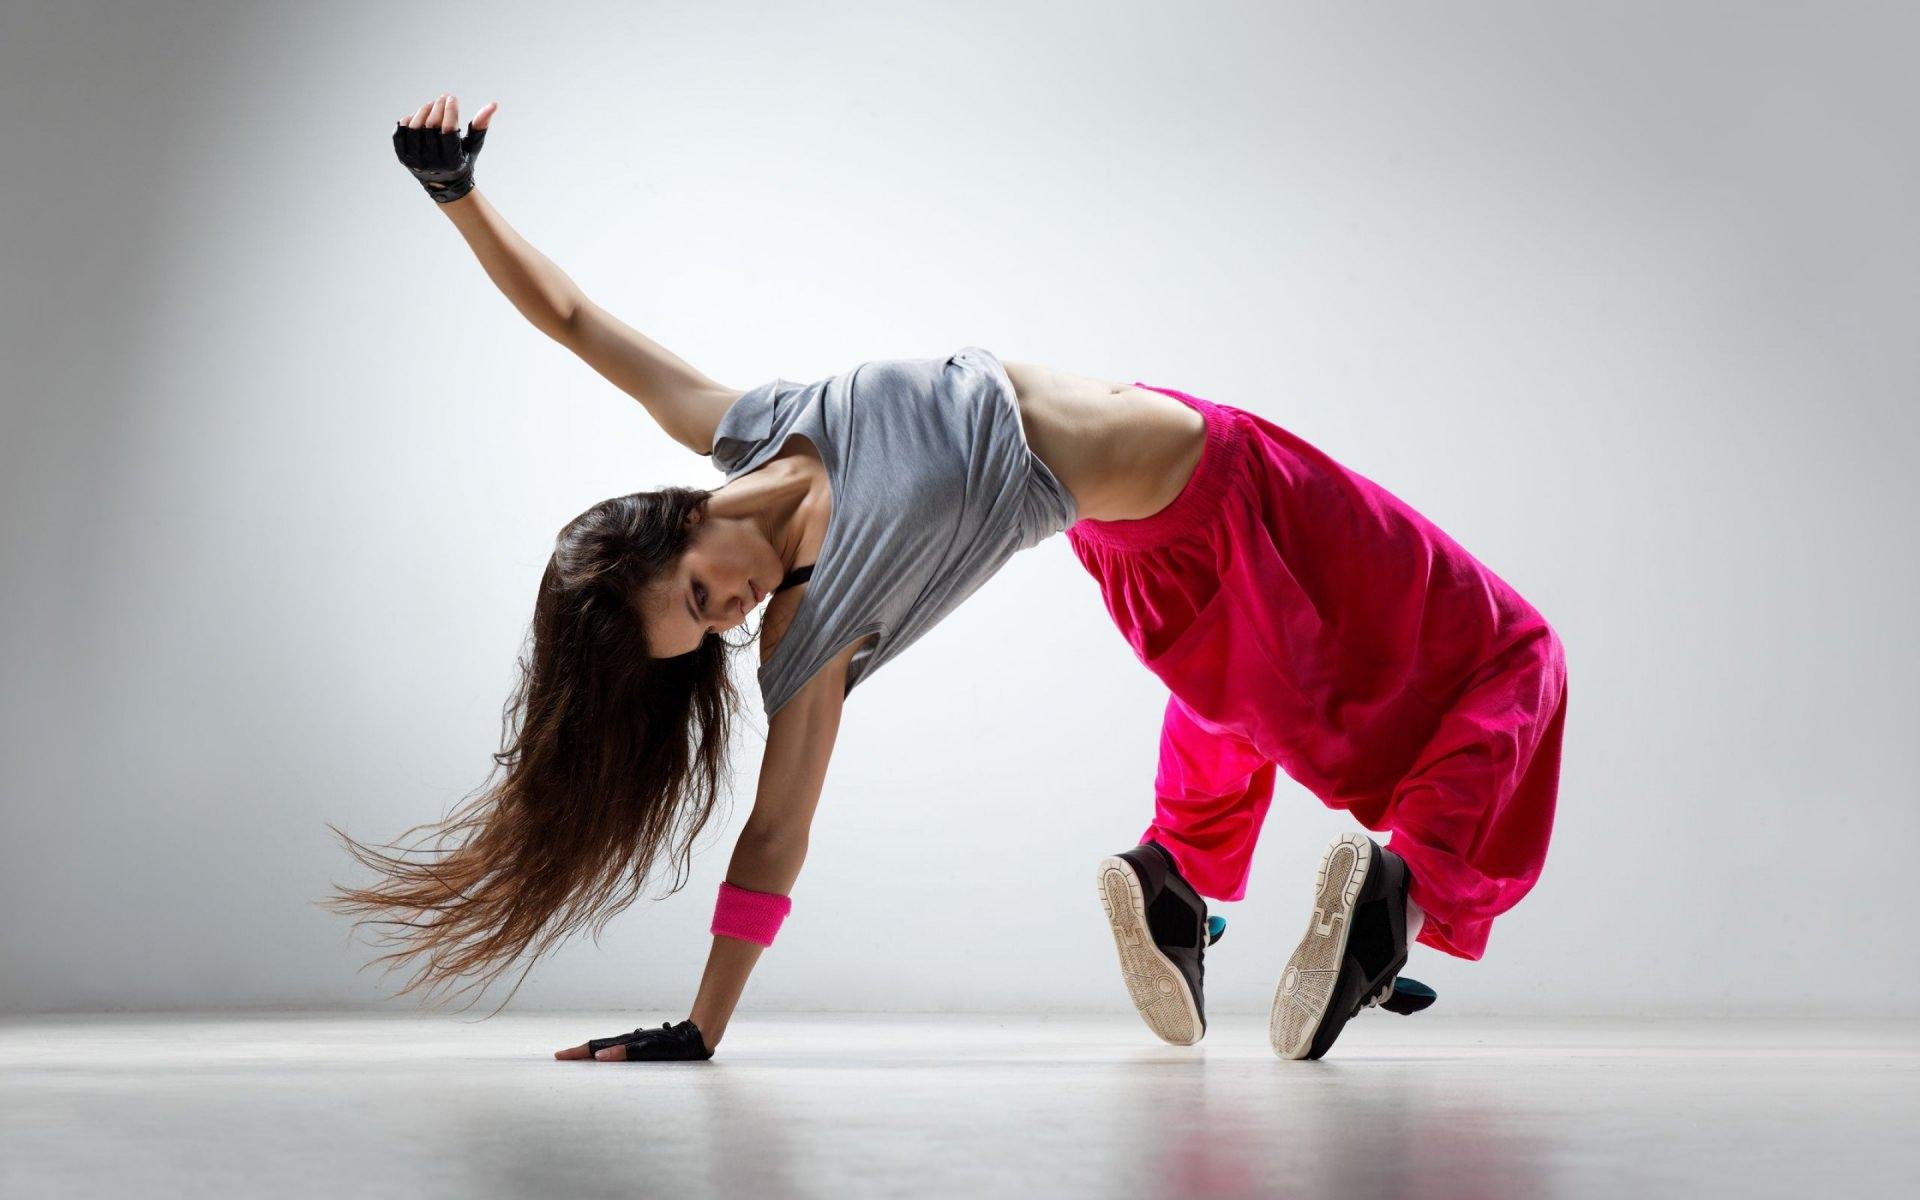 Hip Hop Dance by a Girl